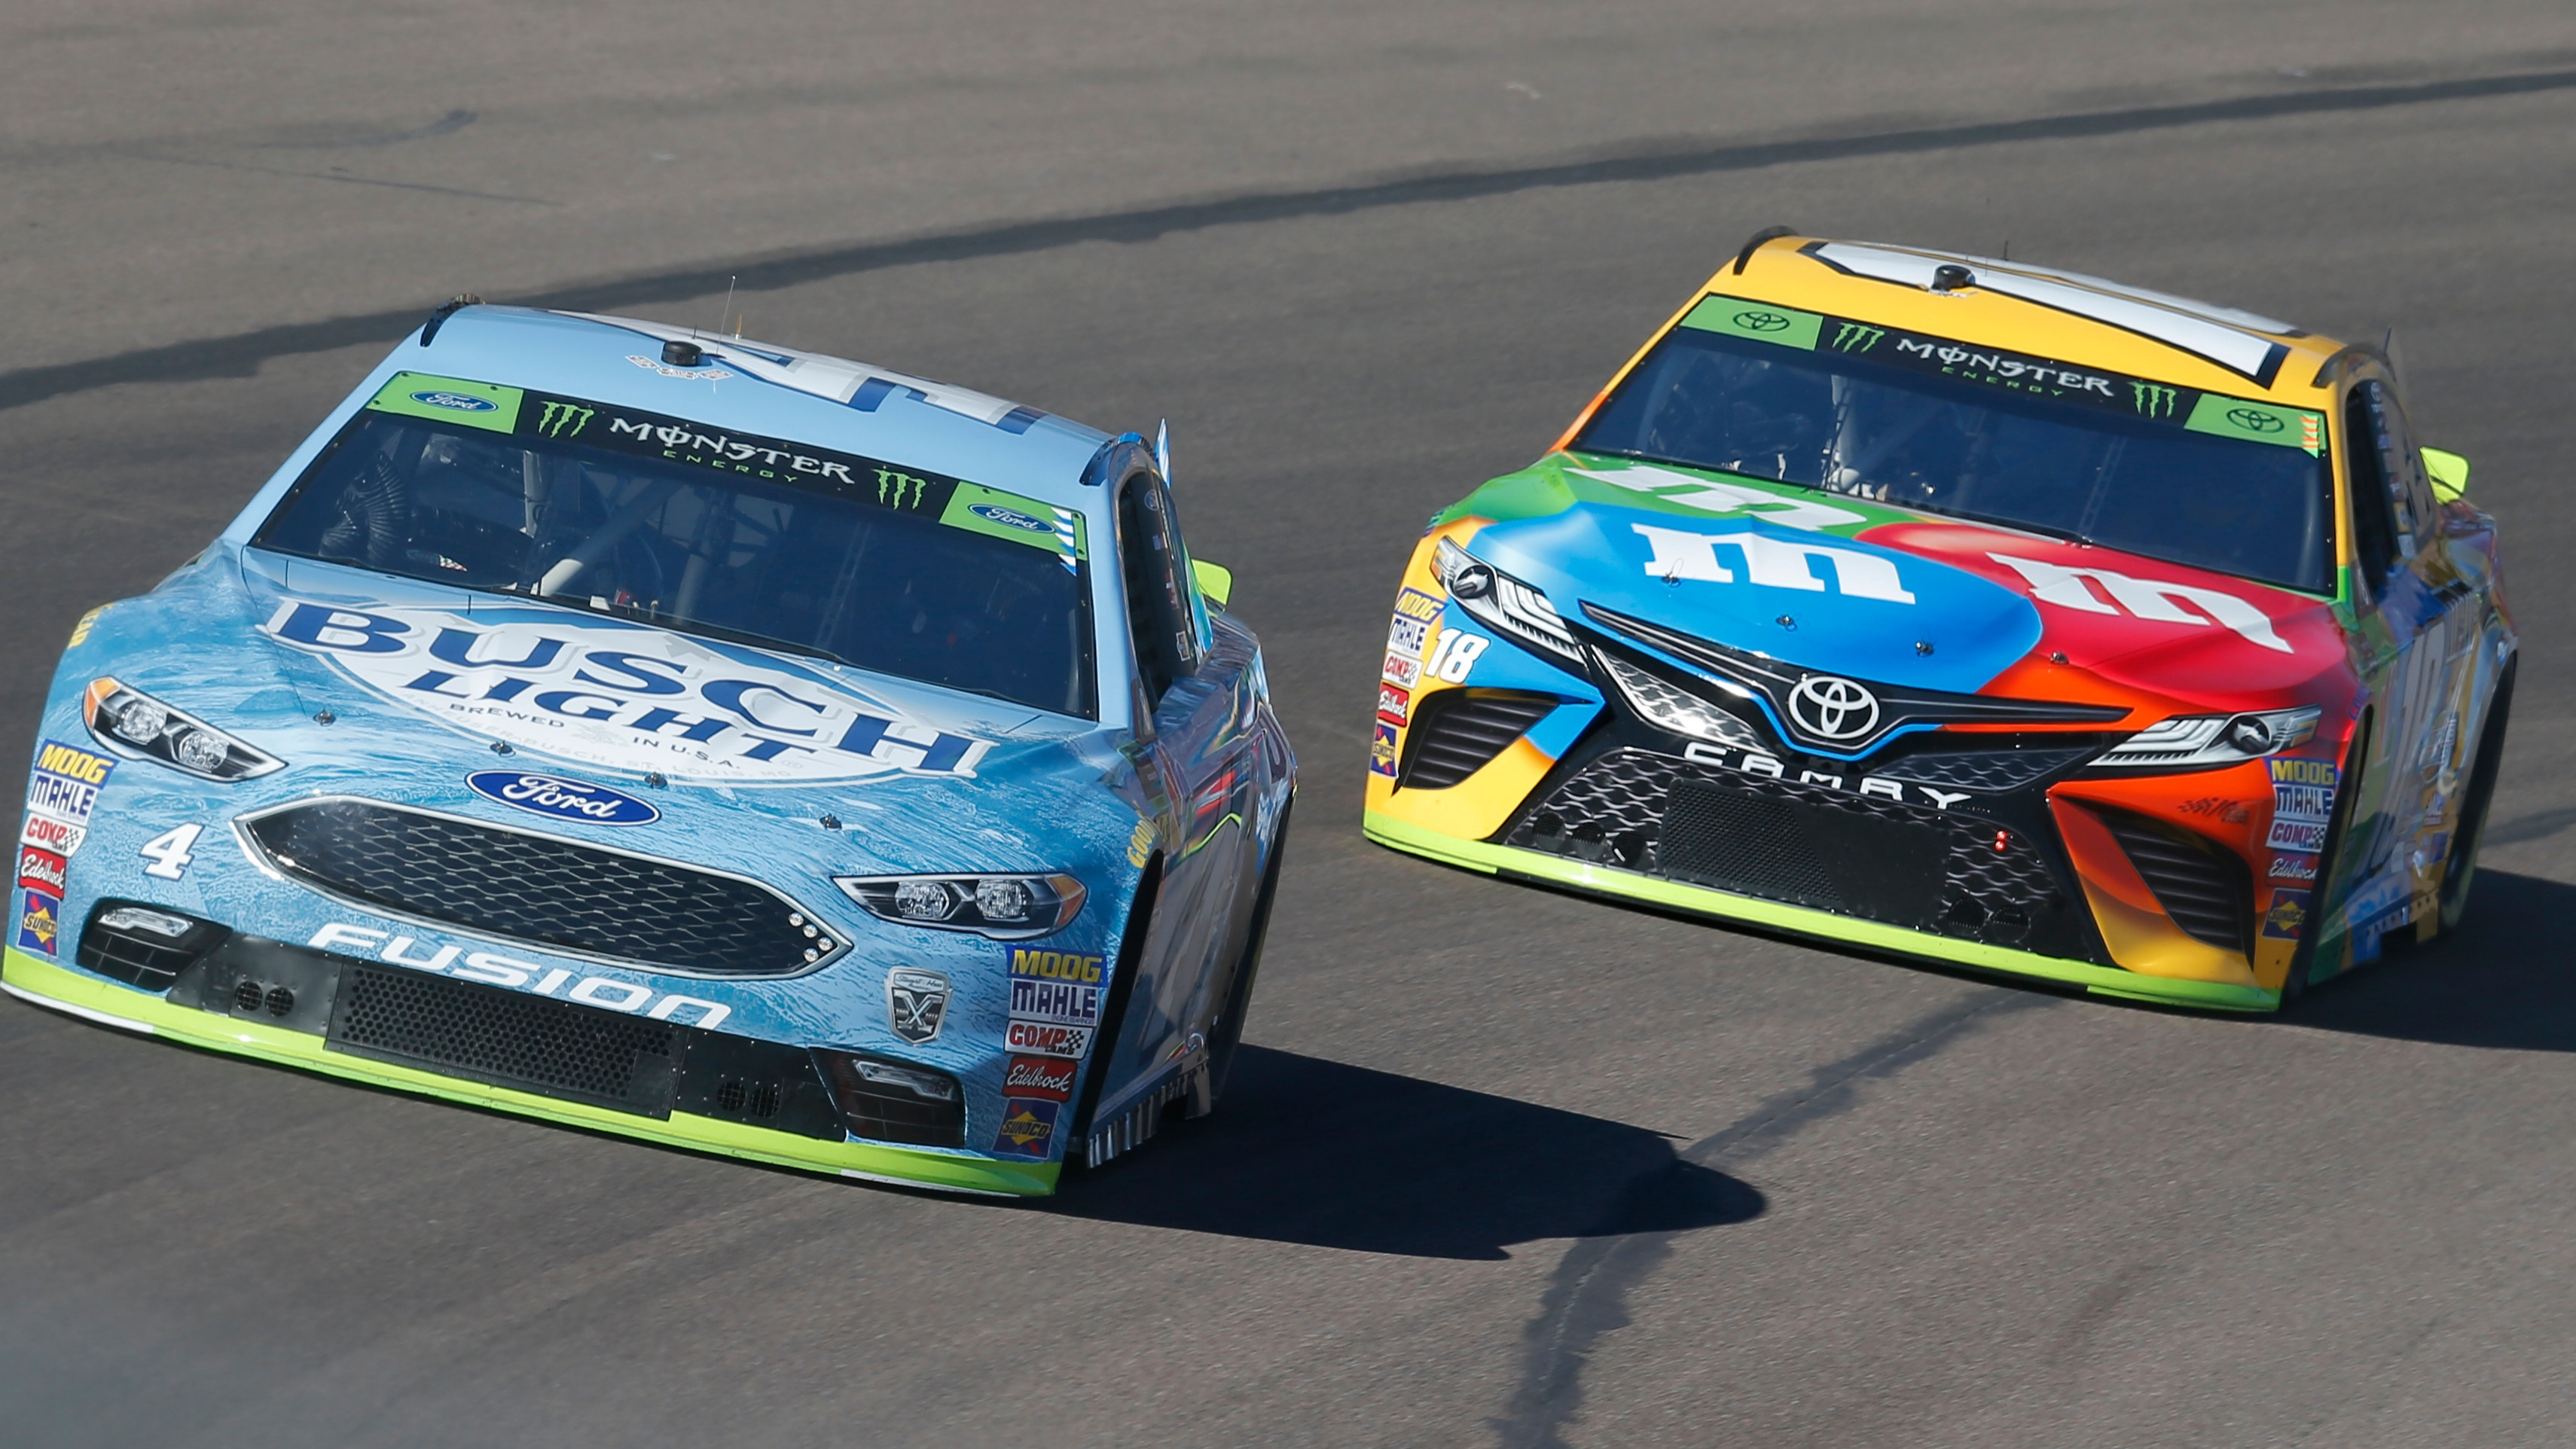 c276fc8c4386 NASCAR at Texas betting odds